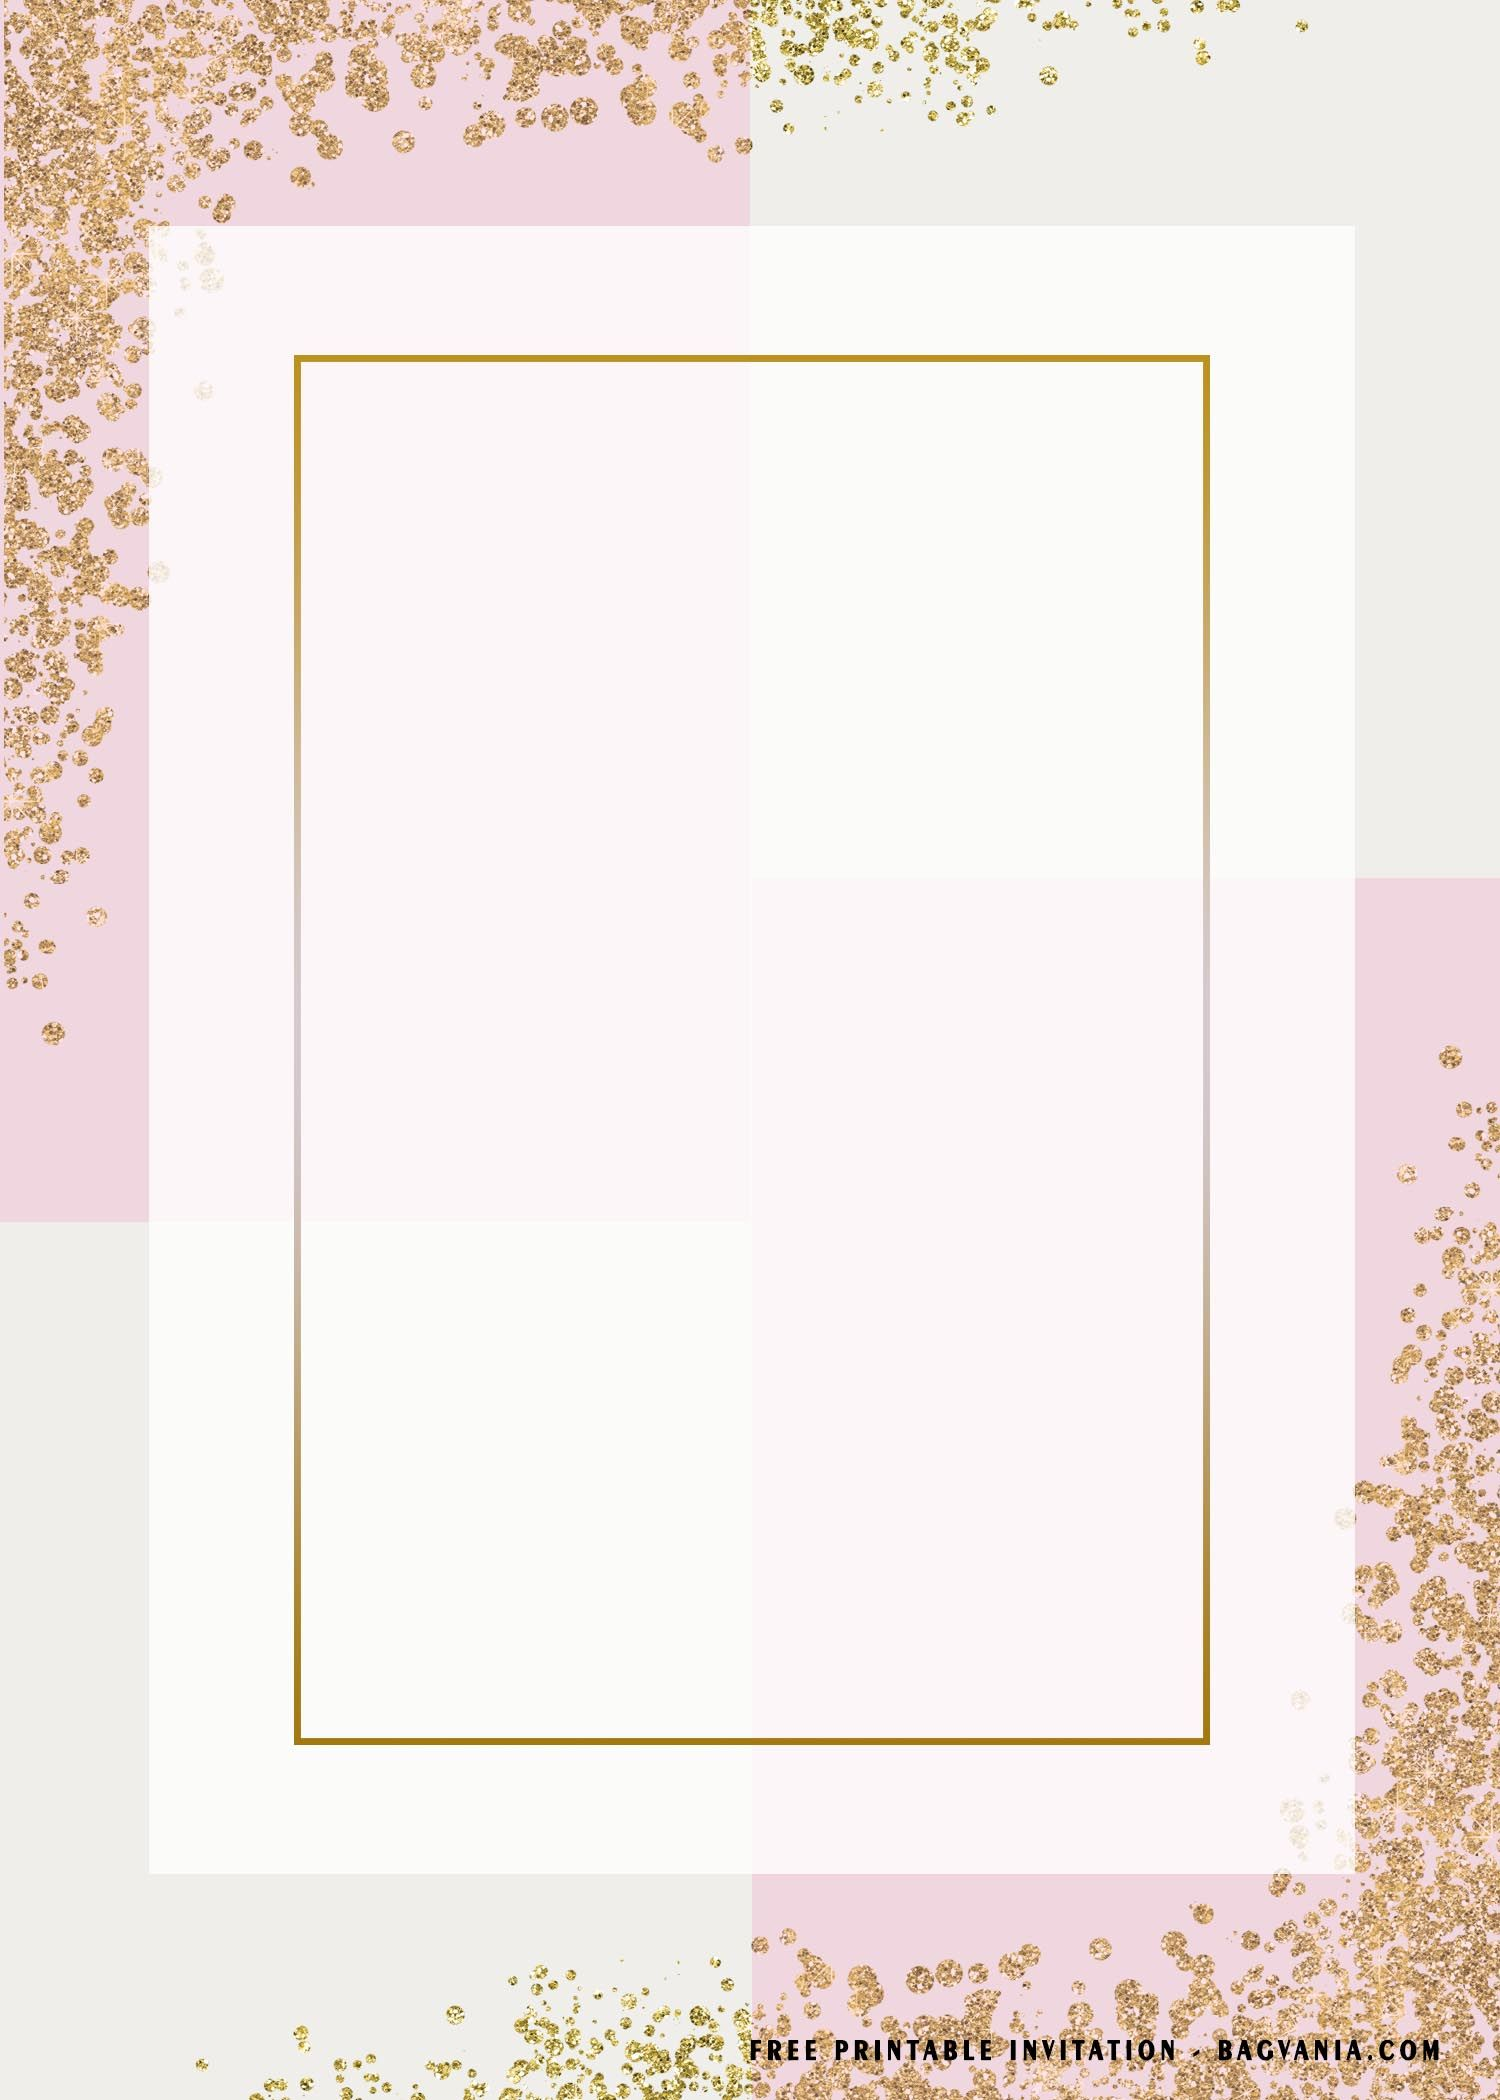 Free Printable Blank Rectangle Birthday Invitation Templates Floral Invitations Template Birthday Invitation Templates Invitation Template Free printable blank invitations template